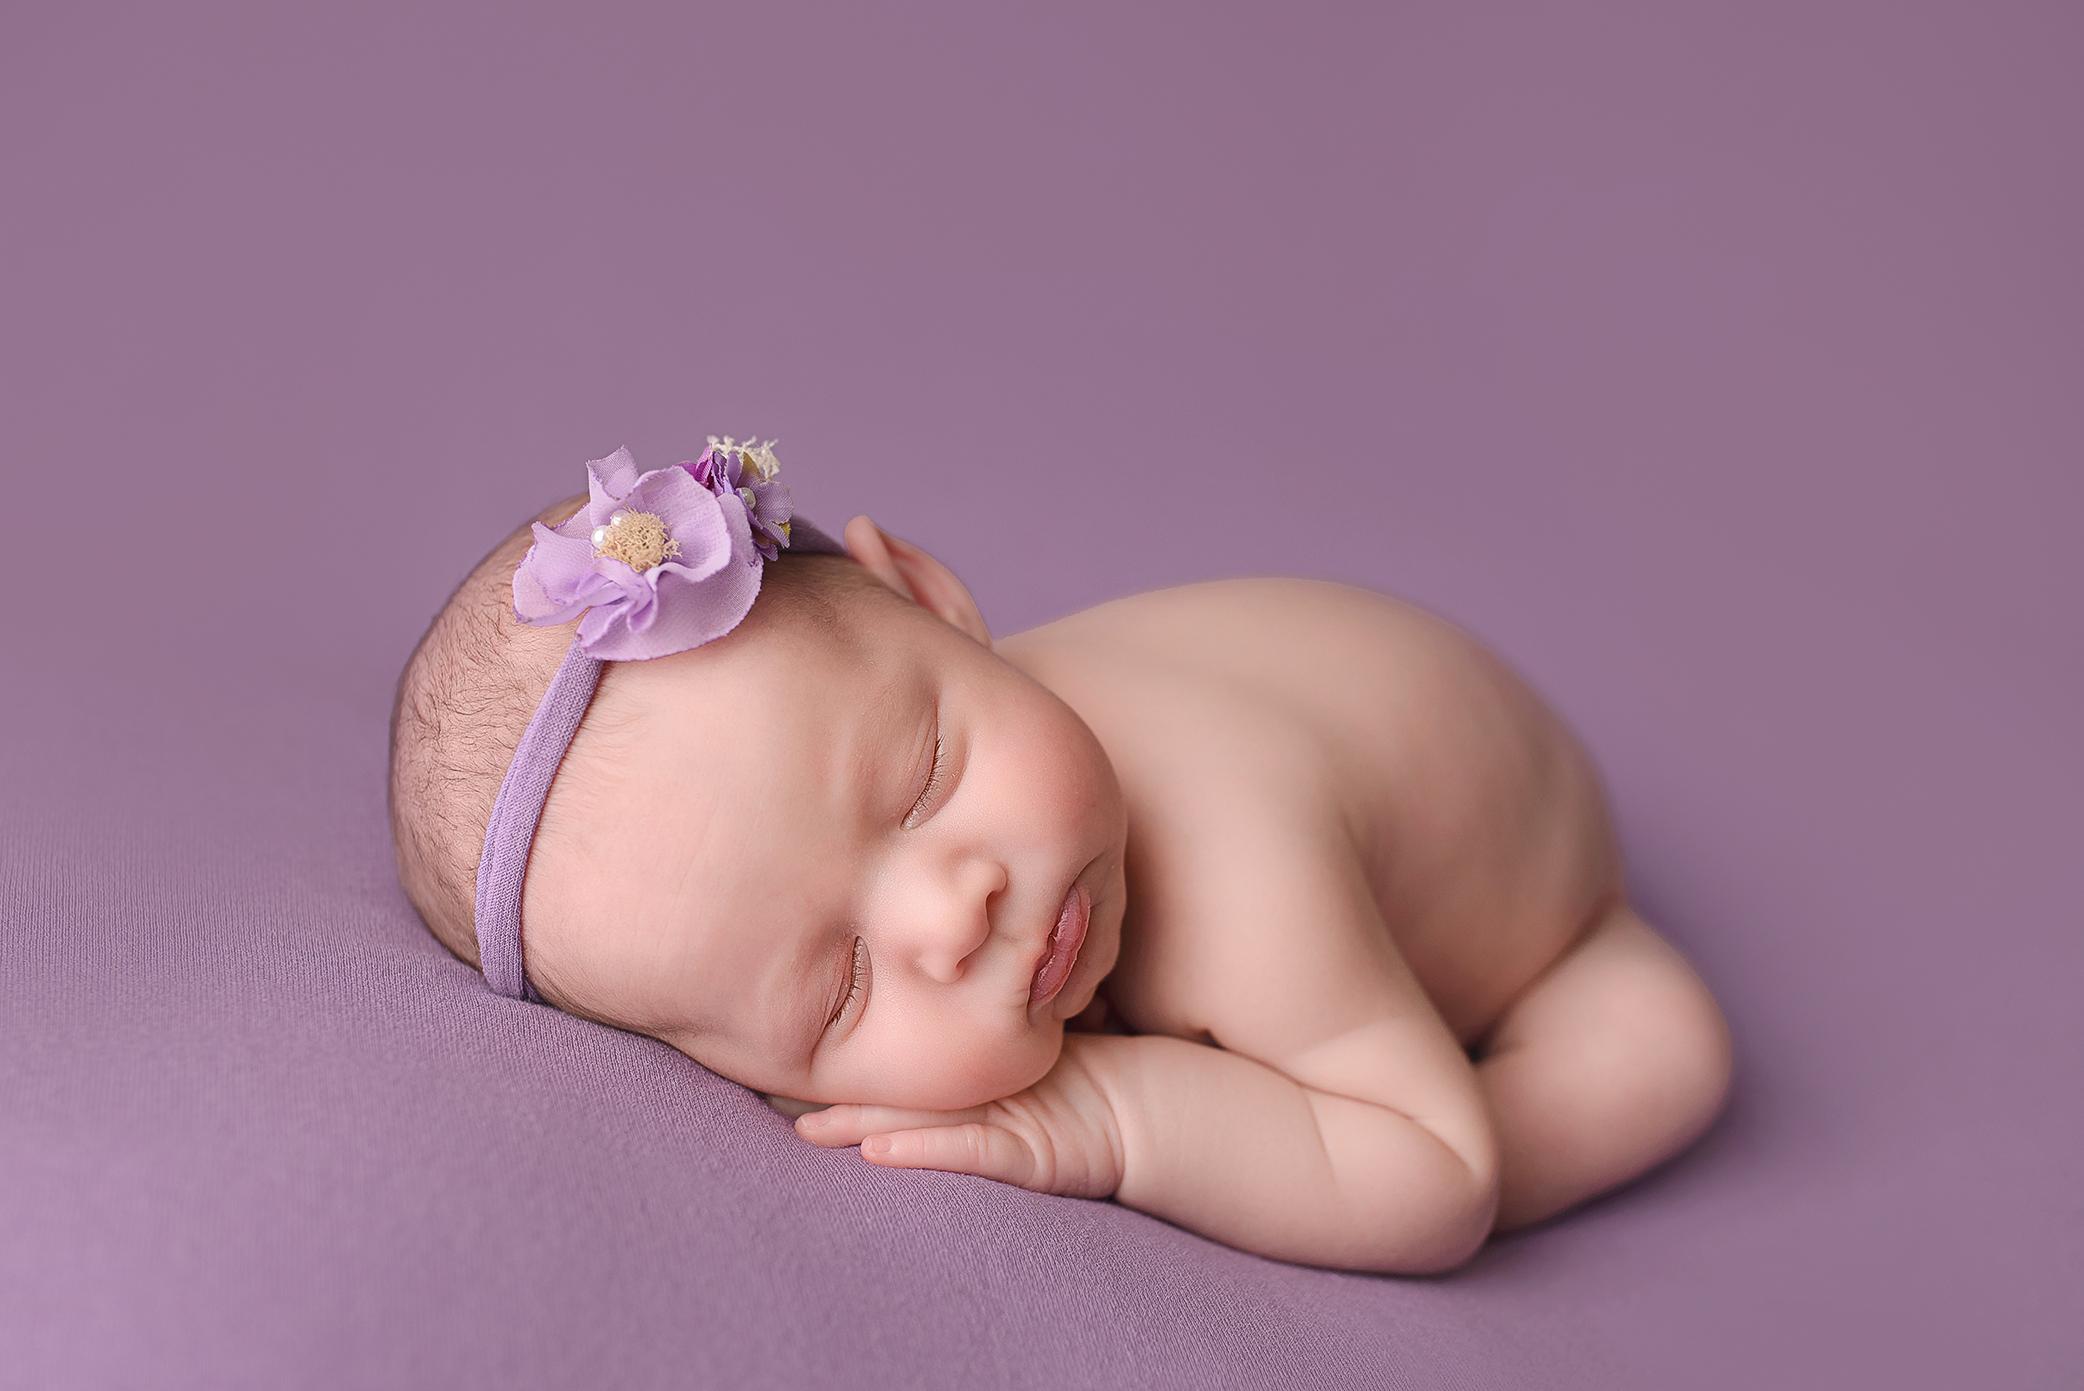 Baby mary oshawa bowmanville courtice whitby ajax durham region gta newborn photography